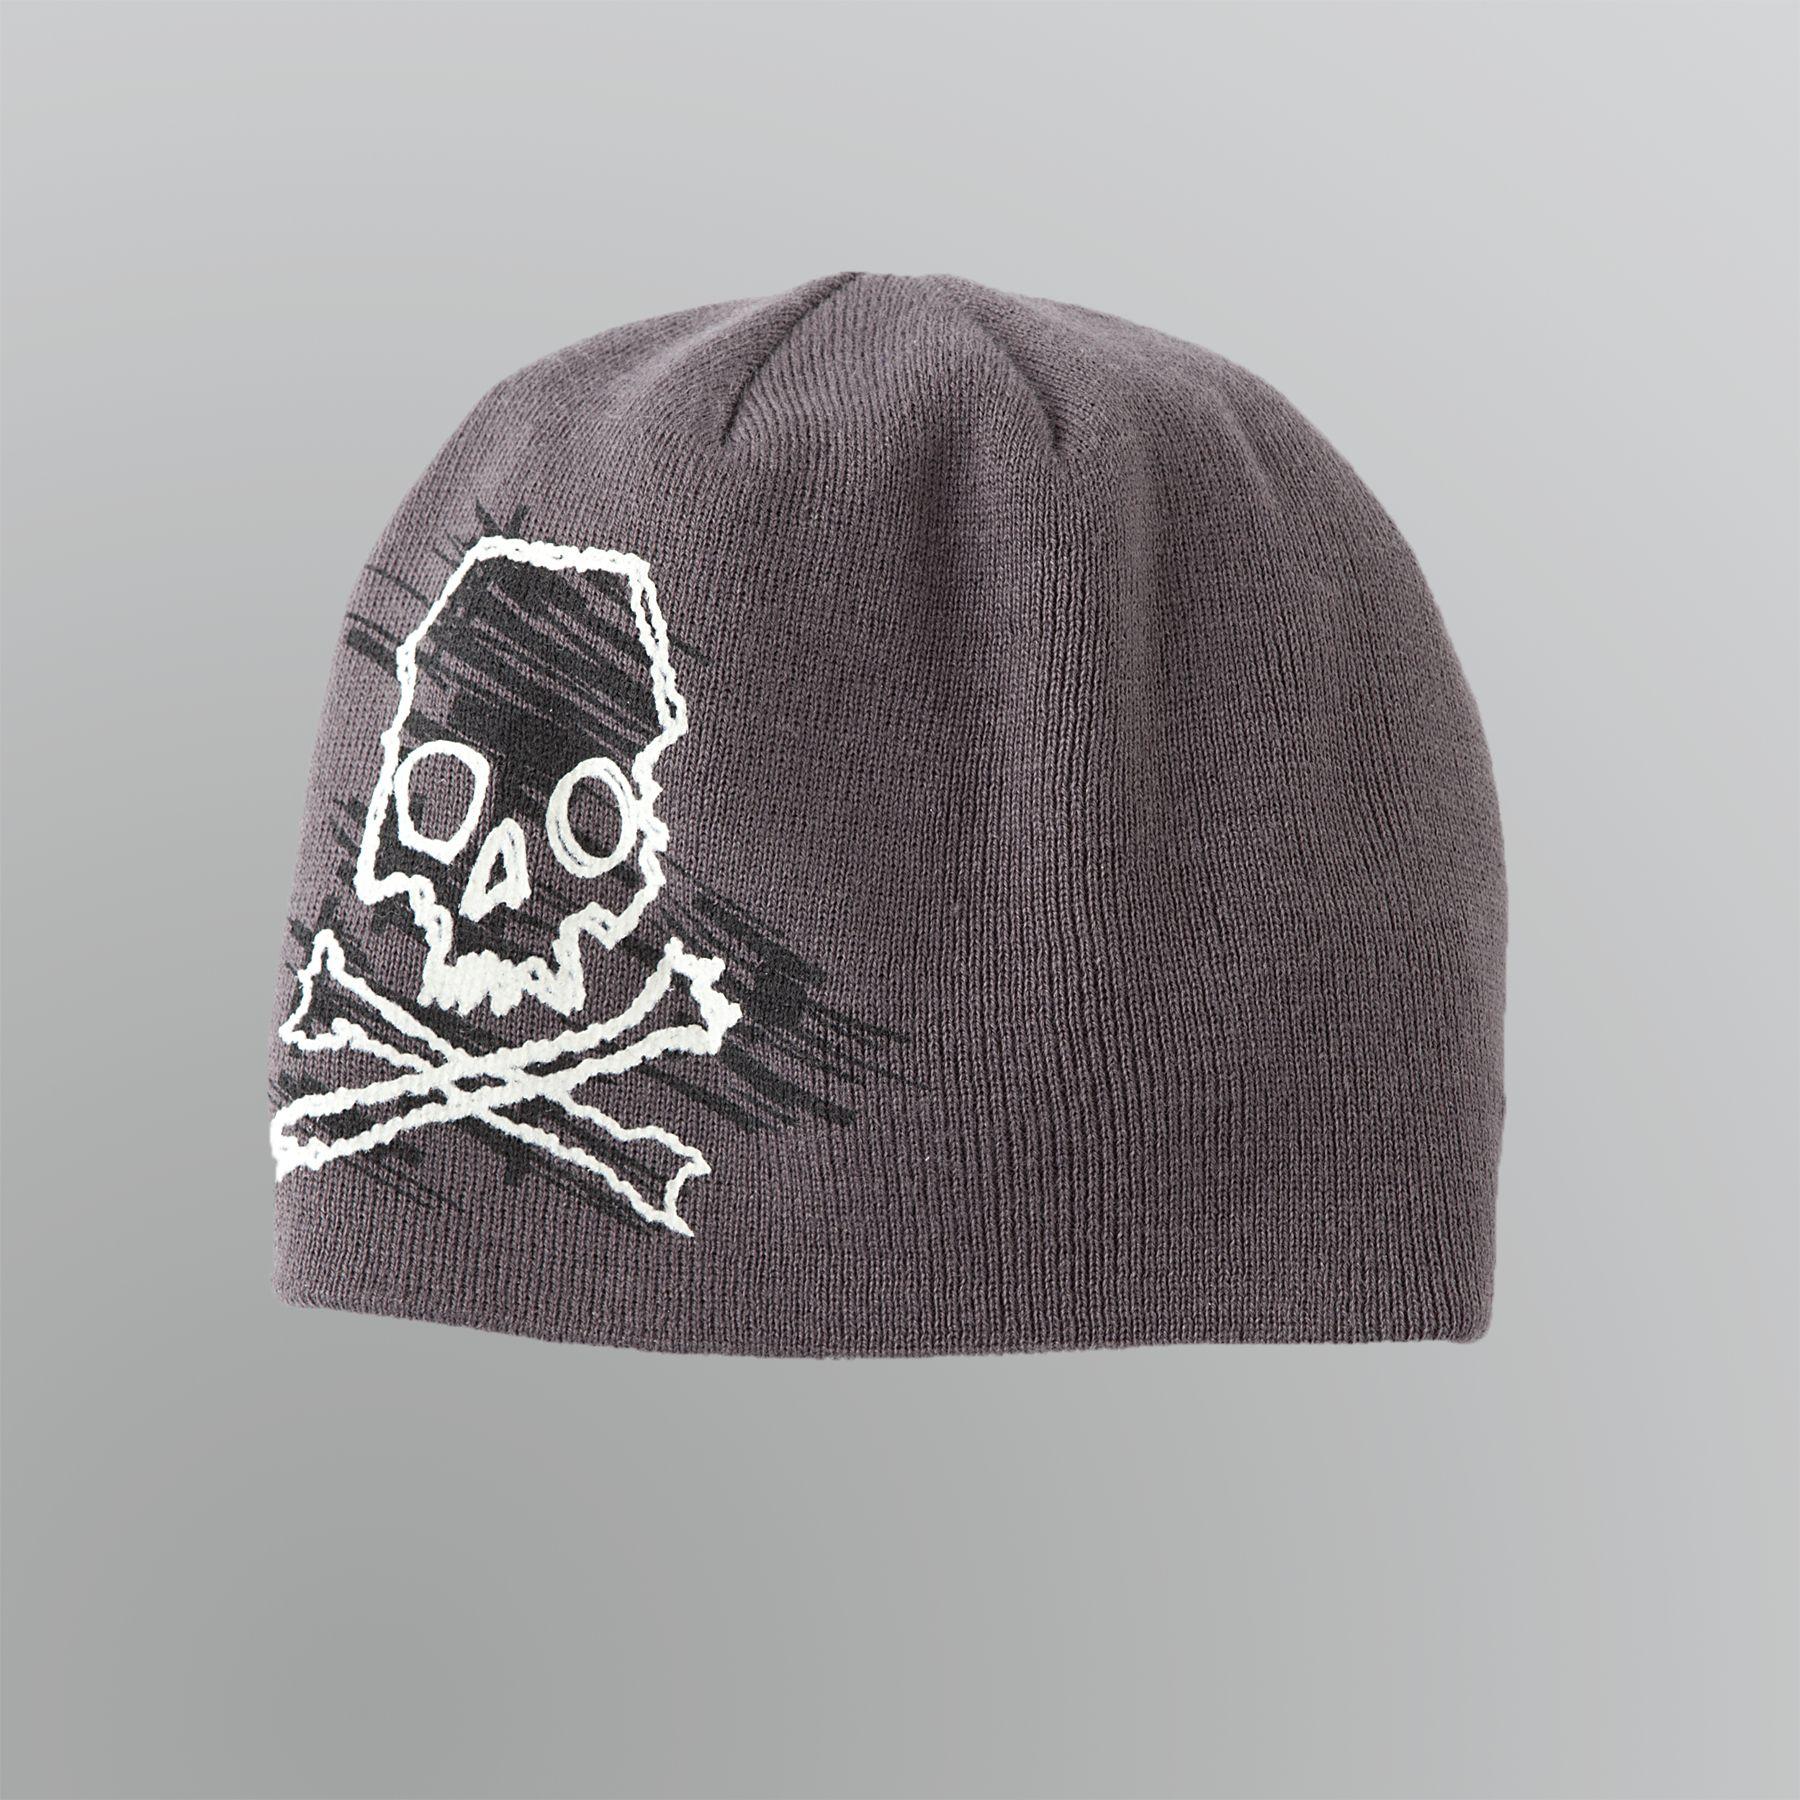 Aquarius Boy s Reversible Skull and Crossbones Winter Cap 773aaef38b78